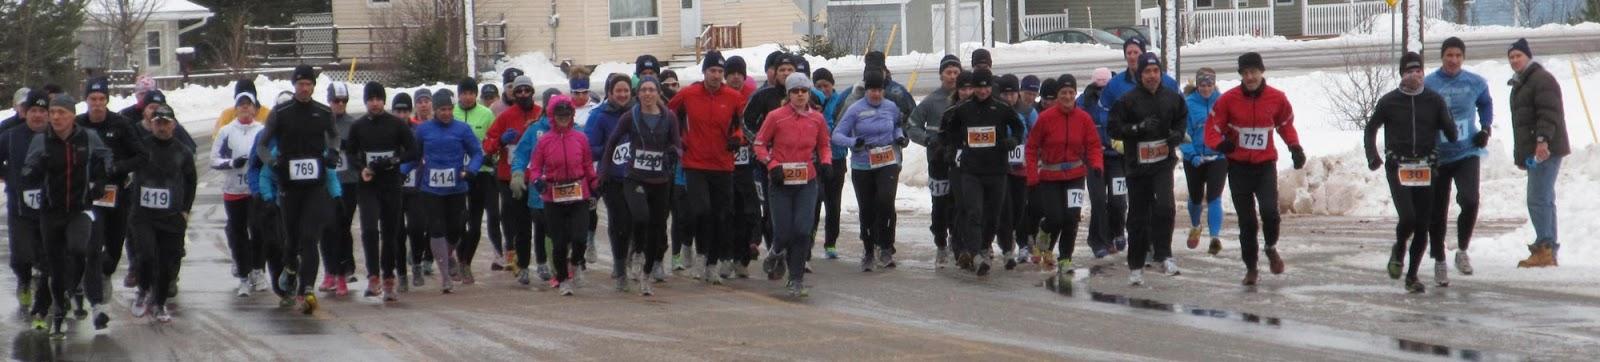 Runman: March 2013